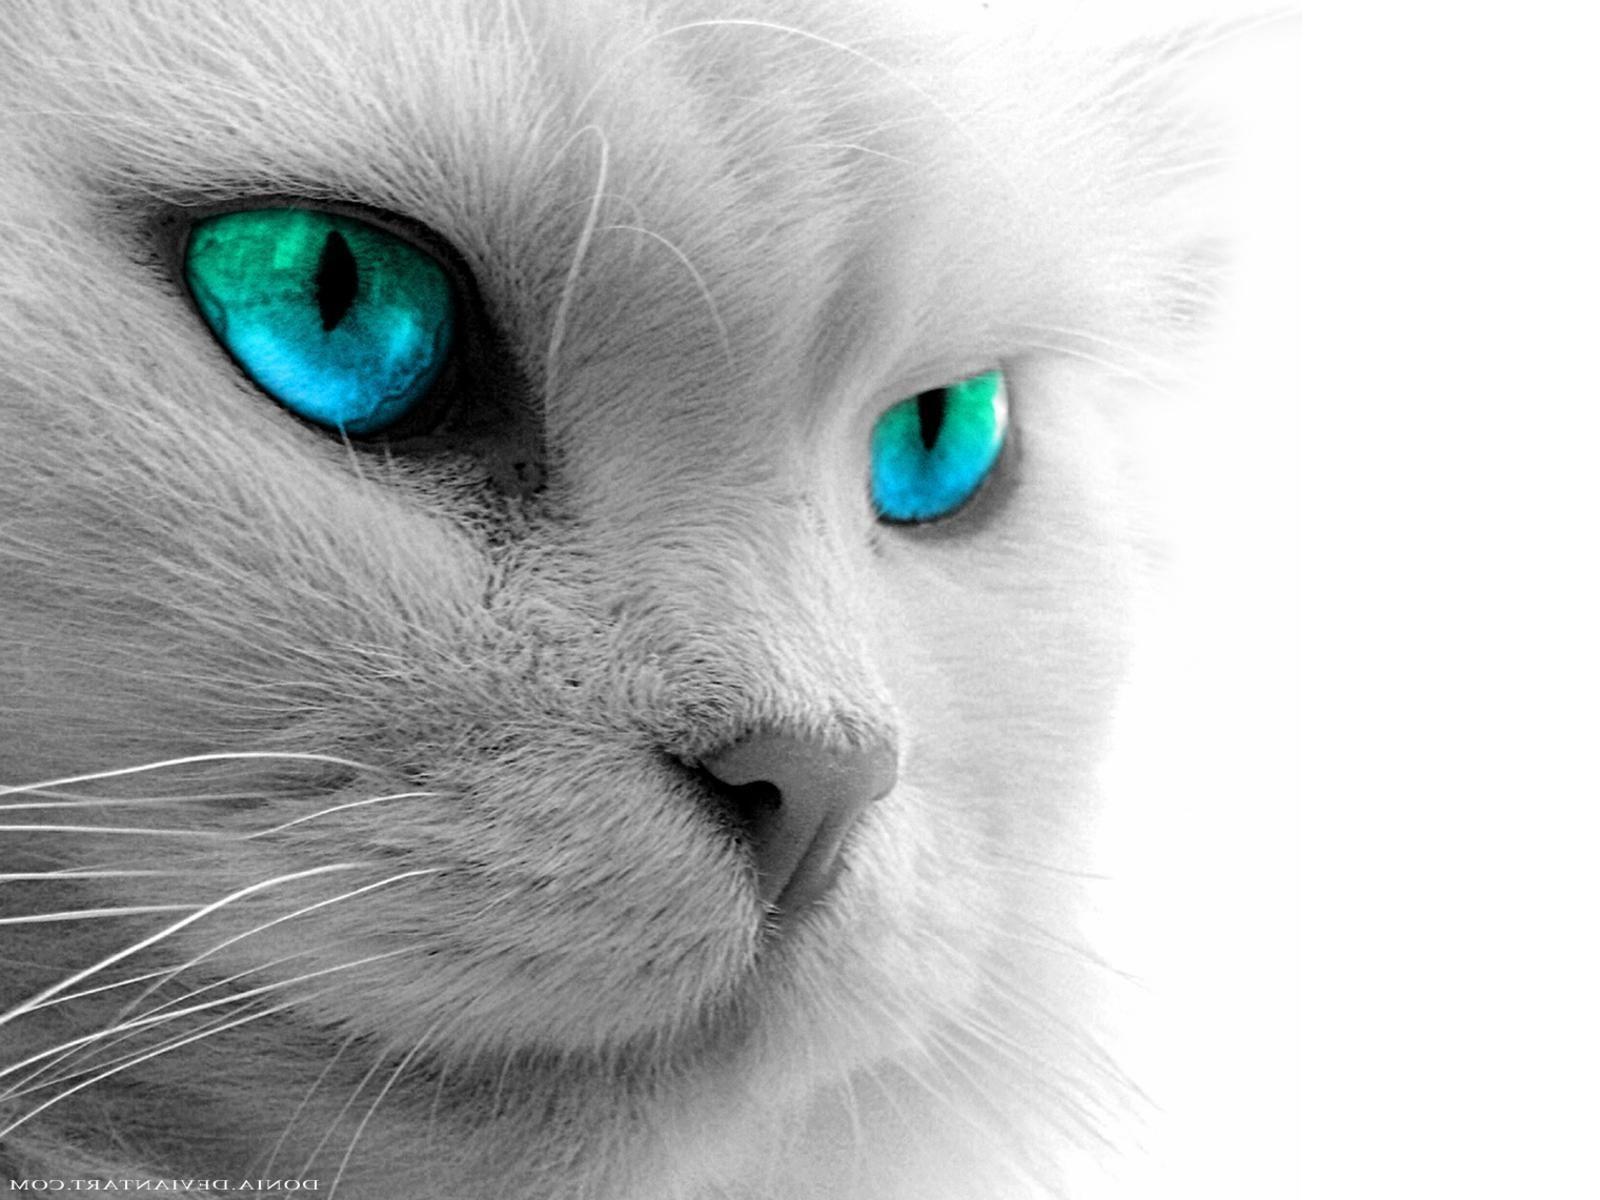 Black Cat Eyes Wallpapers Blue Cat Eyes Yellow Cat Eyes Green